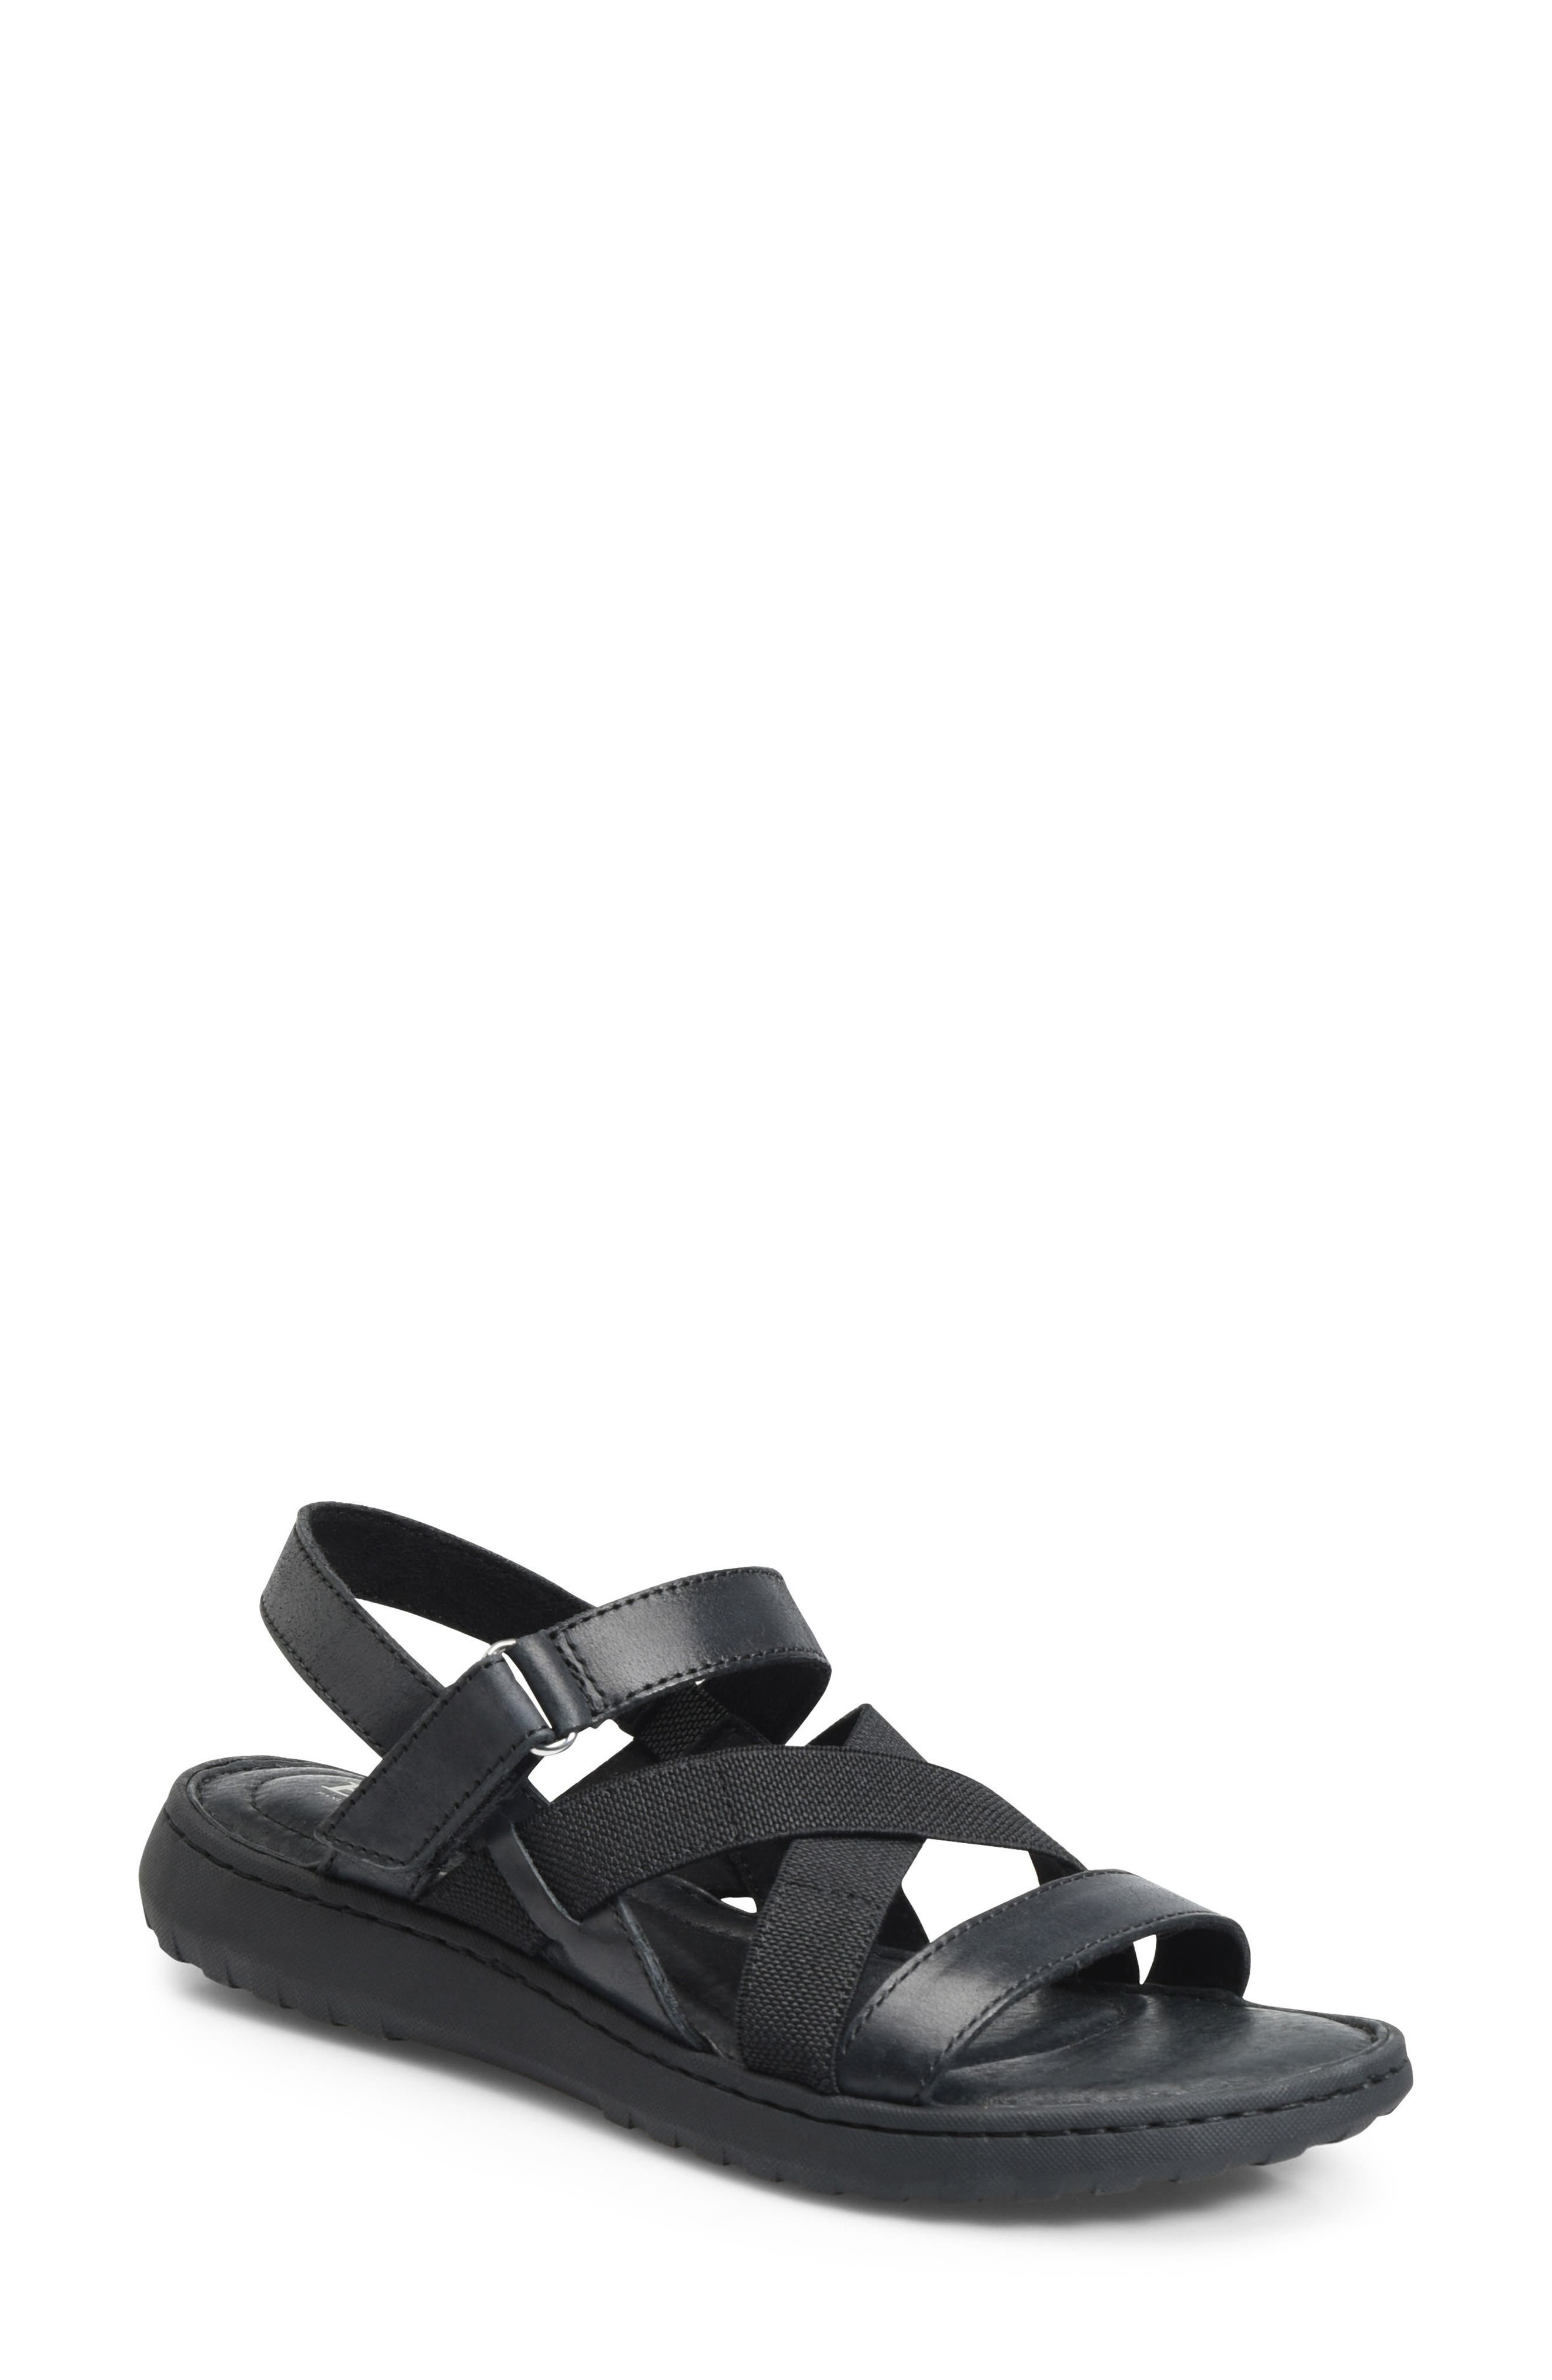 Manta Sandal,                         Main,                         color, BLACK LEATHER